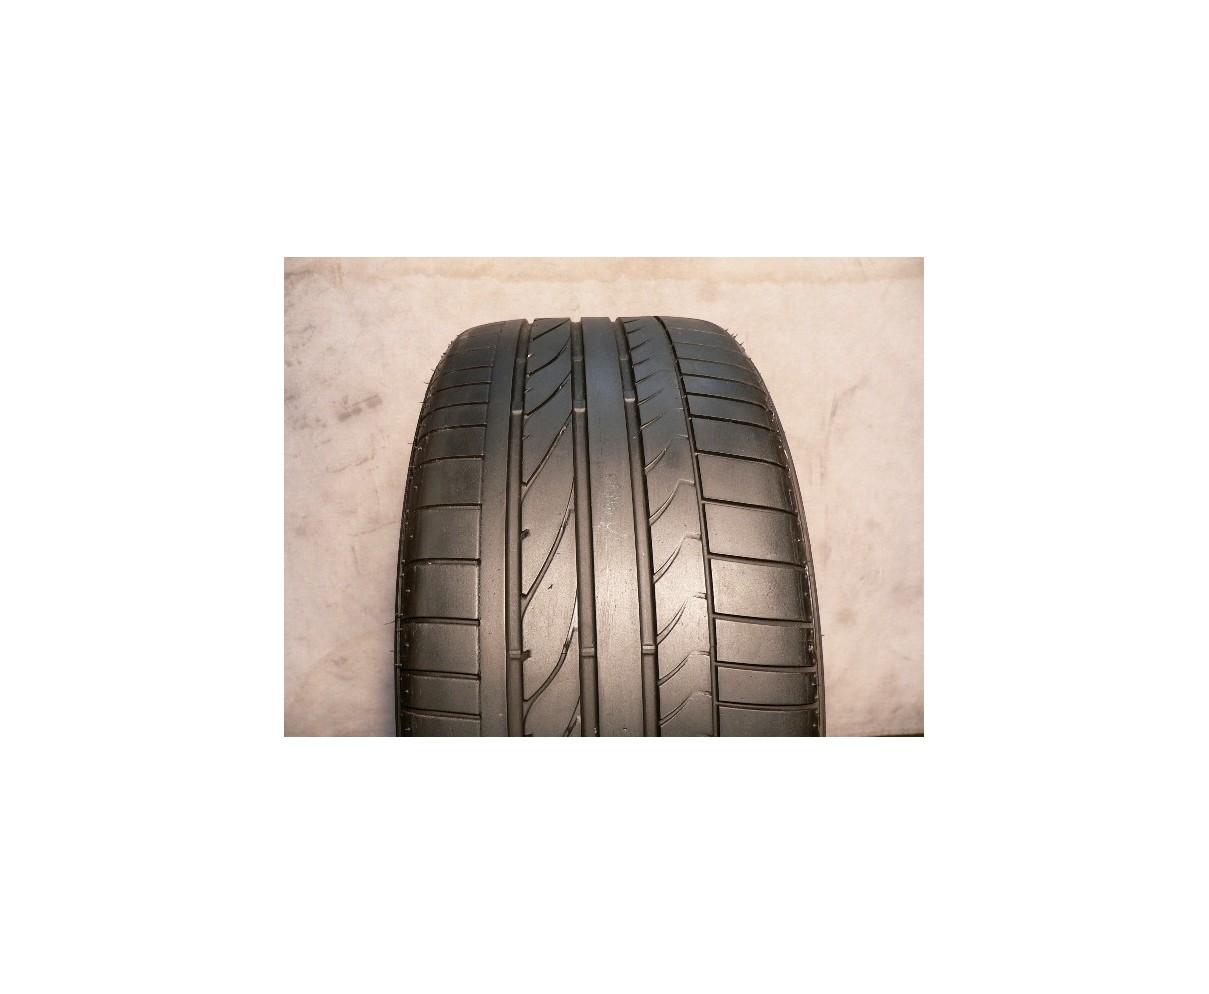 1 used tire 255 50 19 Bridgestone Dueler Sport H/P Run Flat 107V 50% life